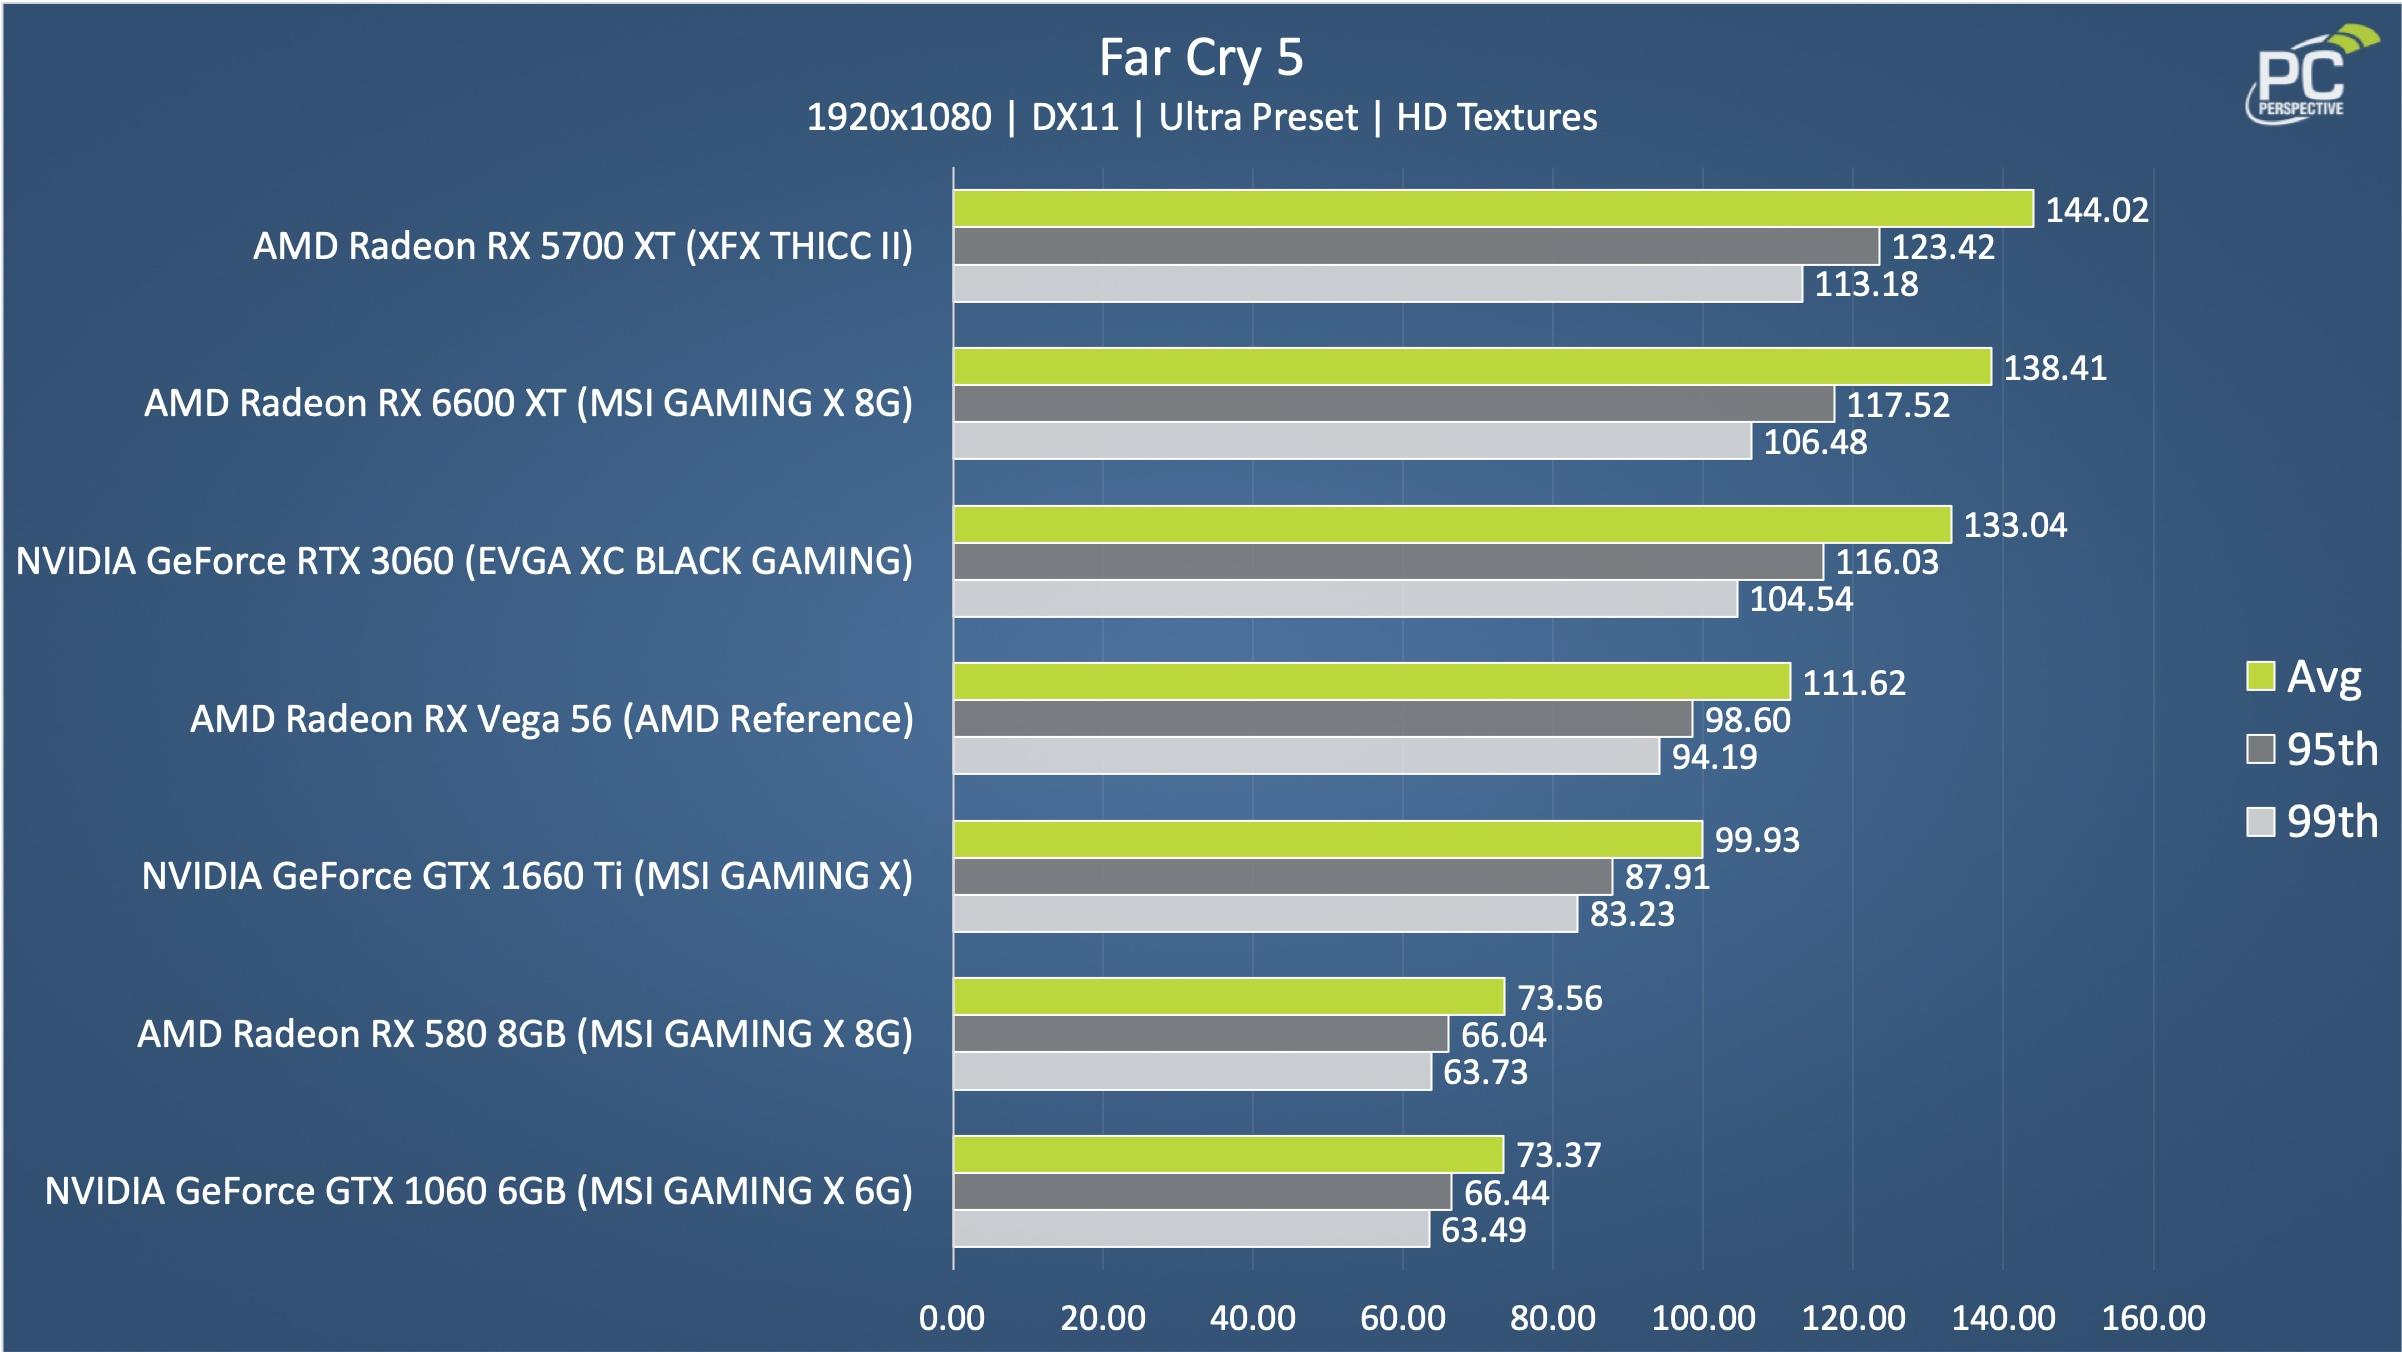 AMD Radeon RX 6600 XT MSI Far Cry 5